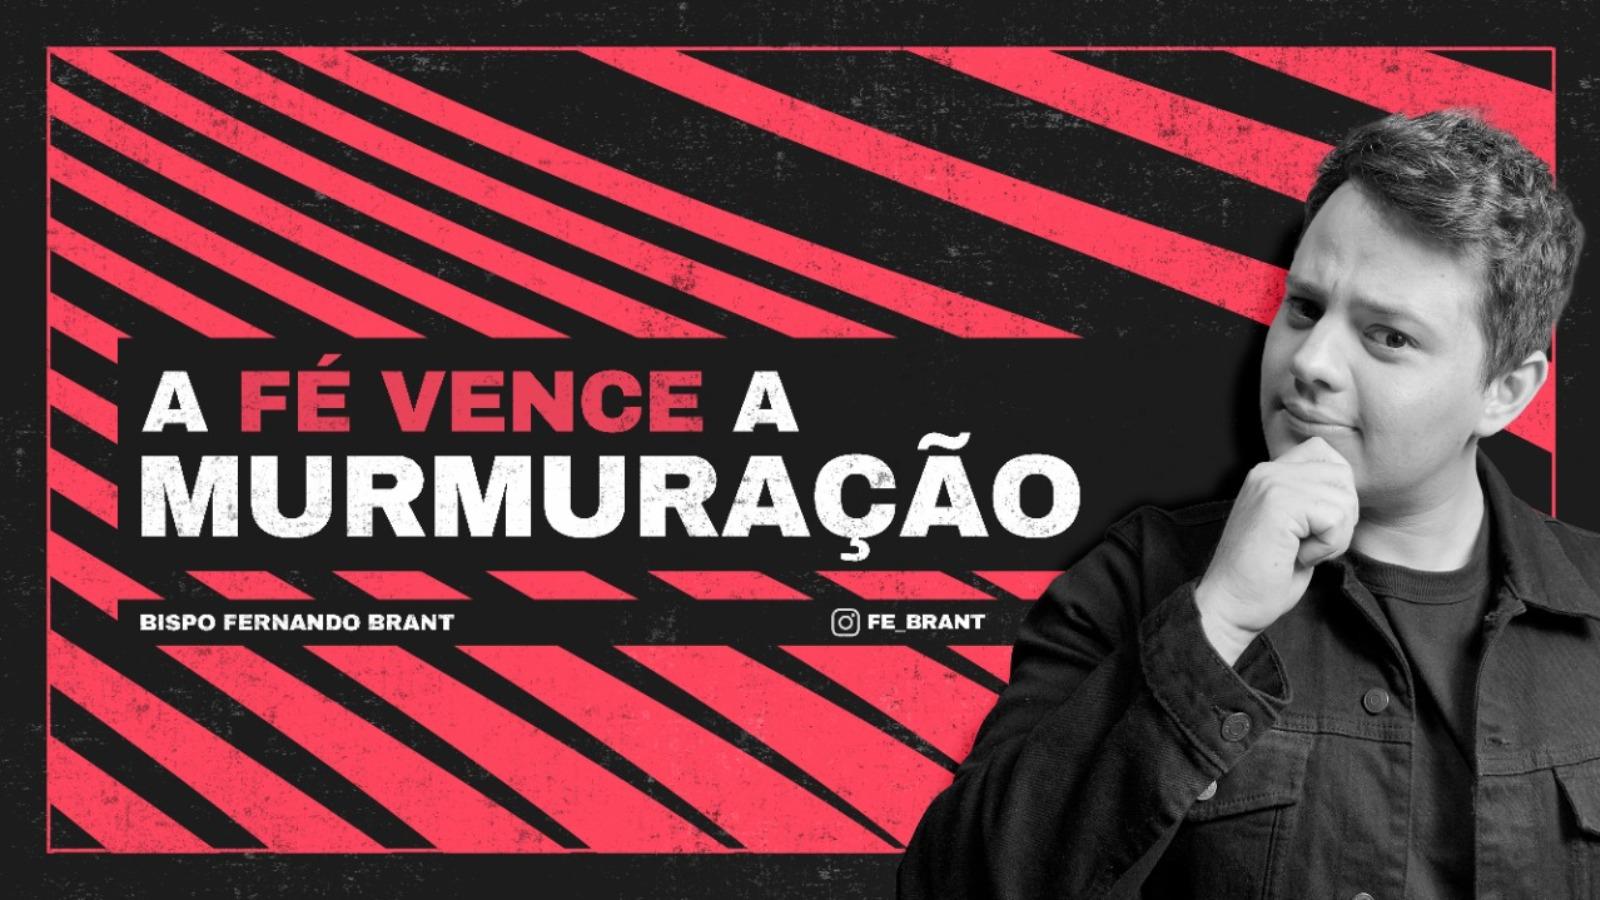 A FÉ VENCE A MURMURÇÃO! // 12/09/2021 // Nº 3708